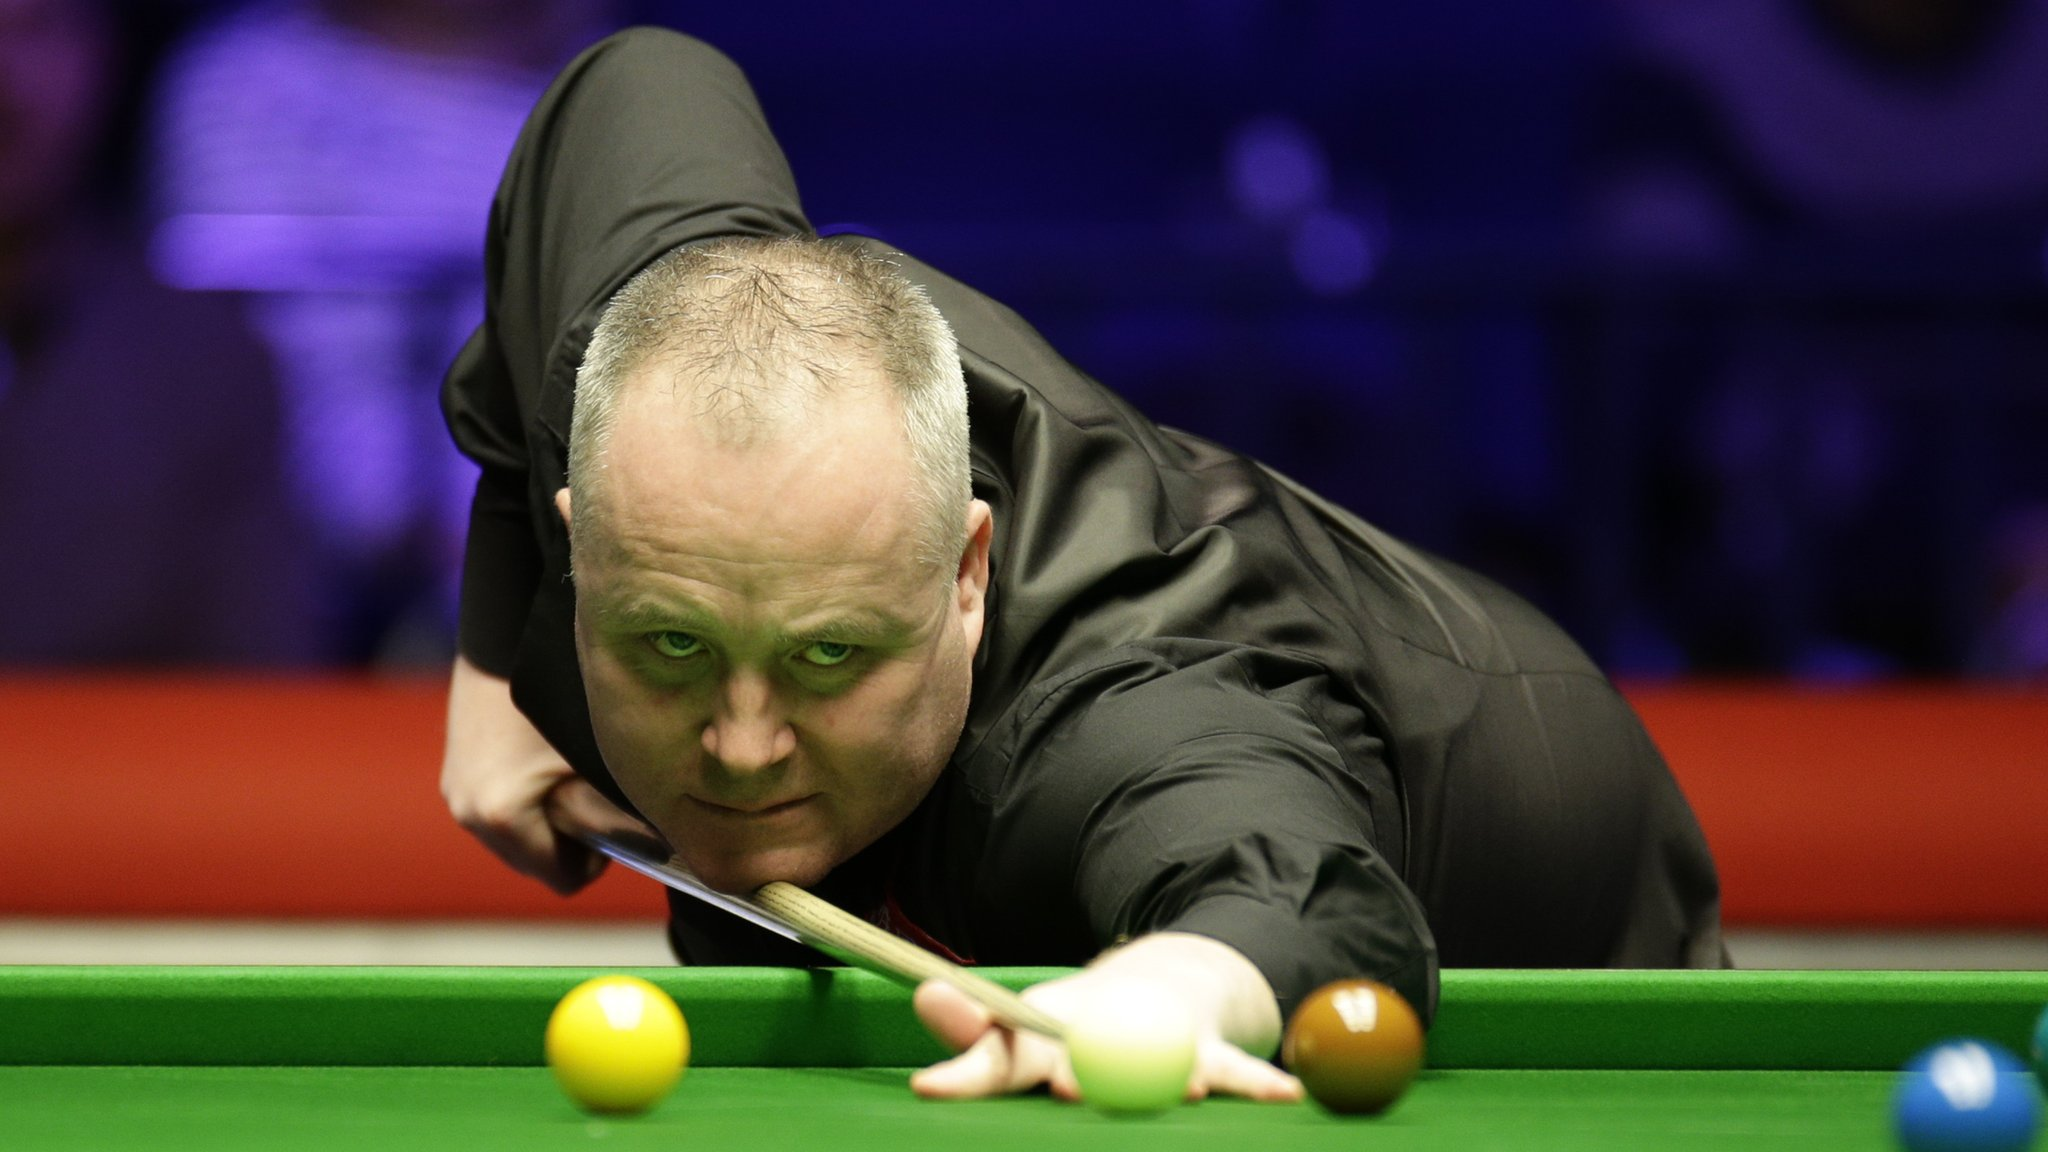 Welsh Open: Joe O'Connor stuns holder John Higgins